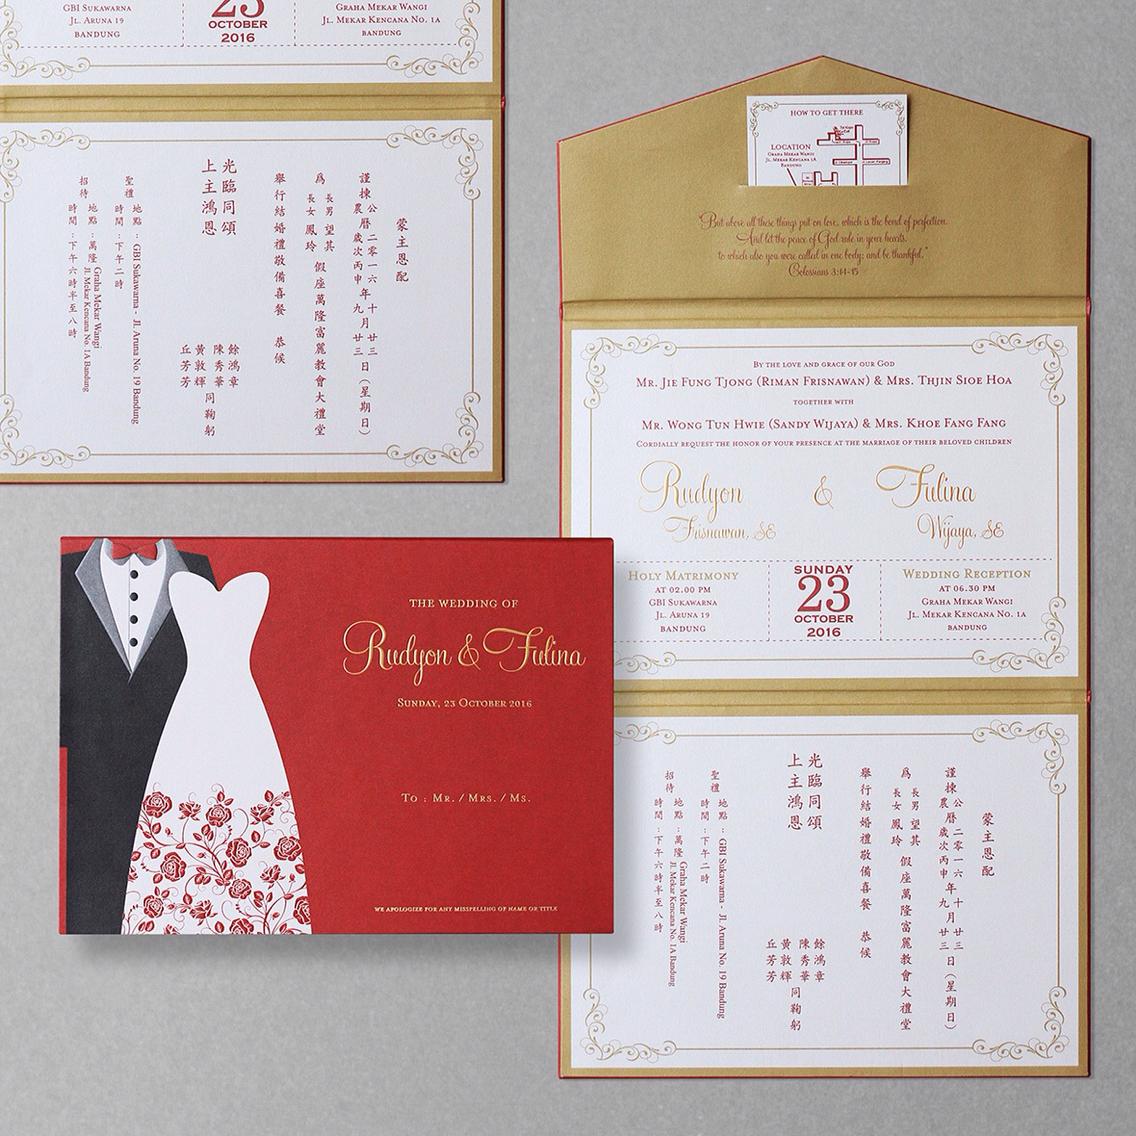 Directory of Wedding Invitations Vendors in Bandung | Bridestory.com